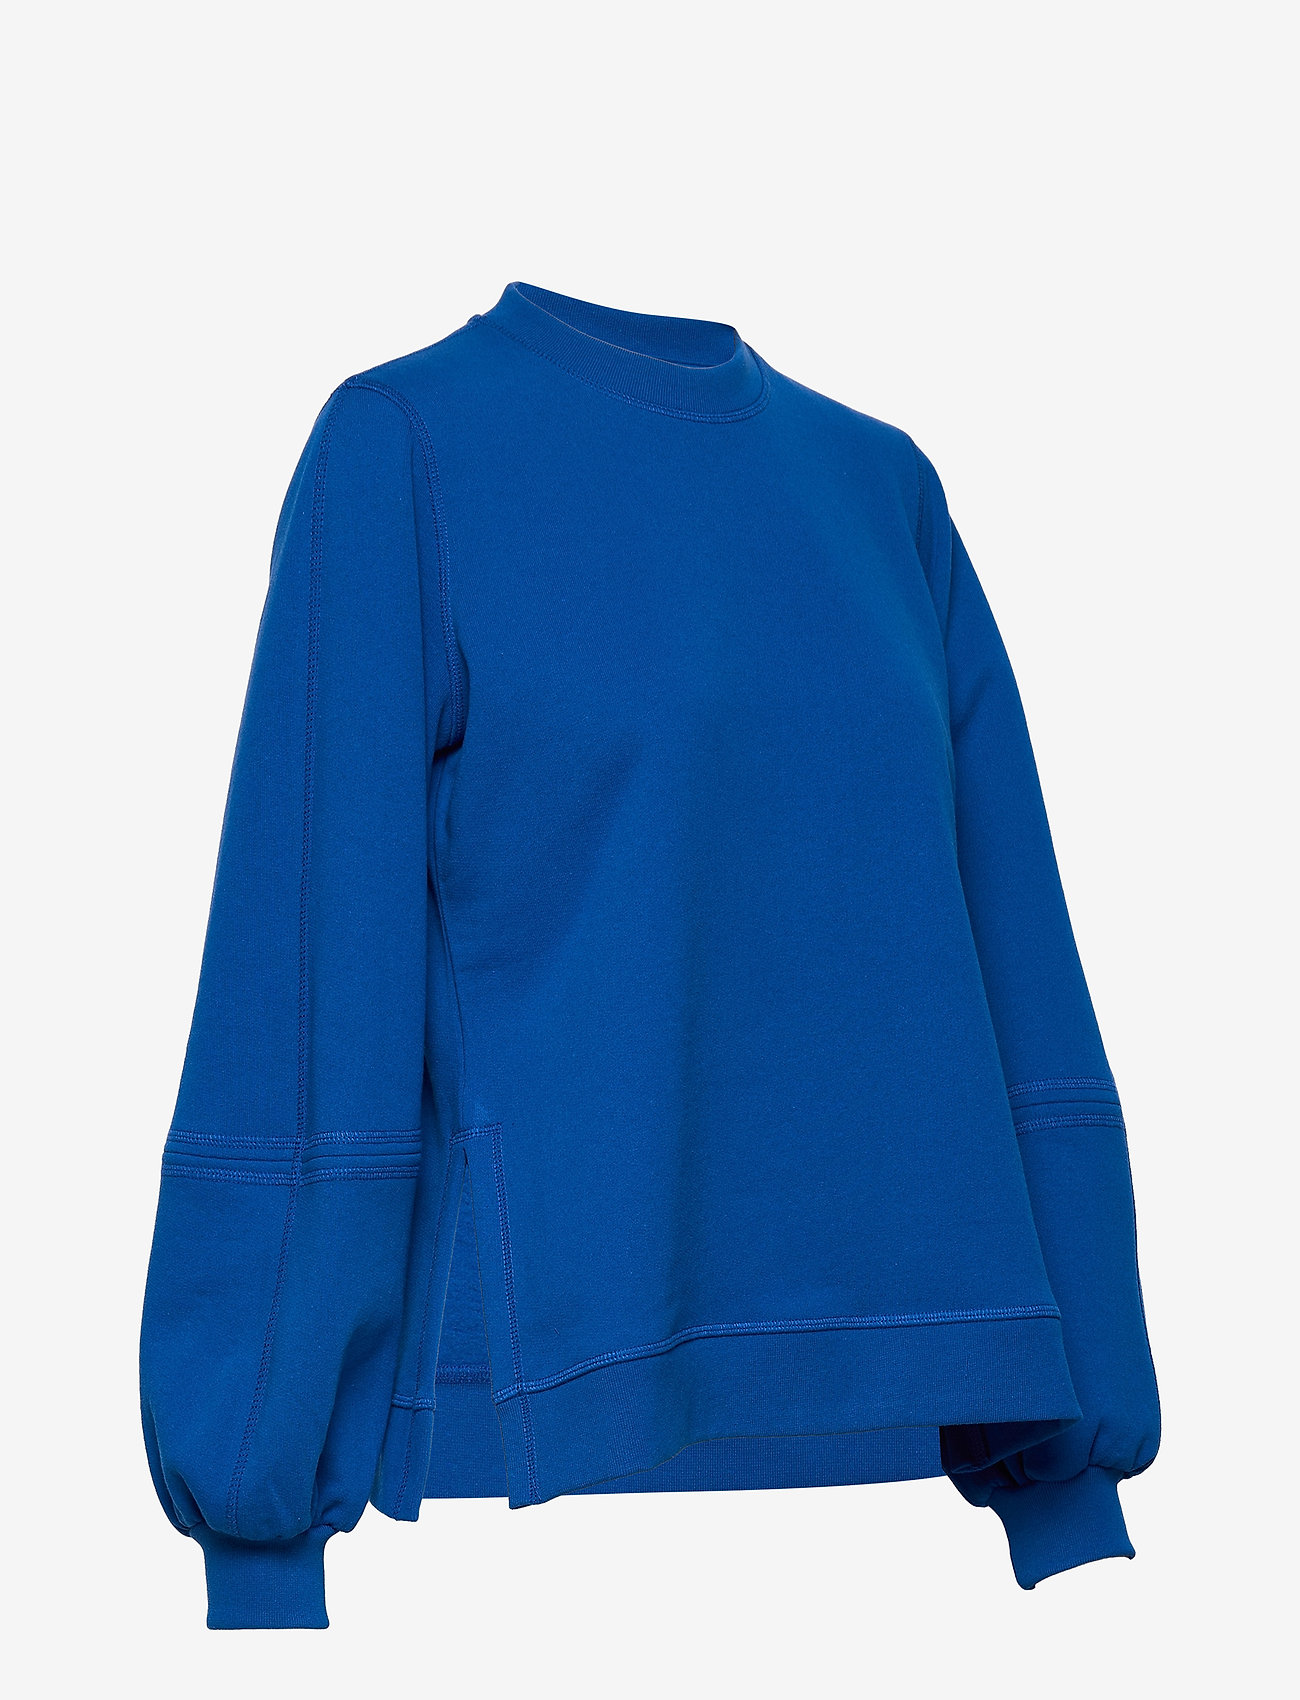 Ganni - Software Isoli - sweatshirts & hoodies - daphne - 3